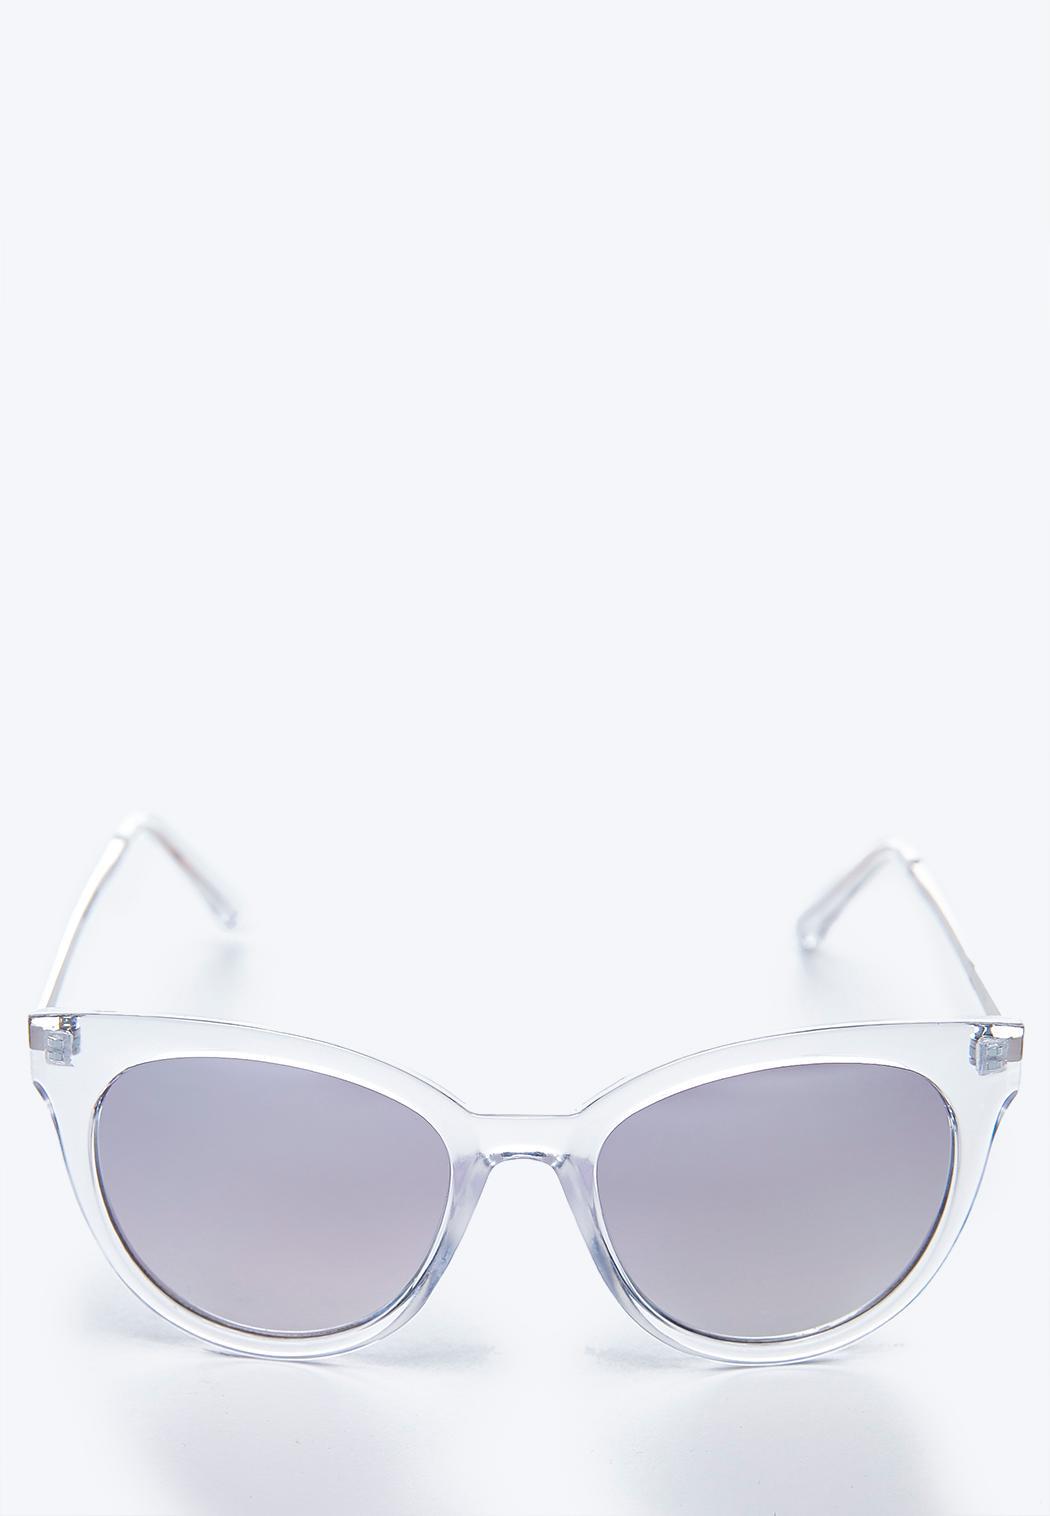 Round Fashion Sunglasses